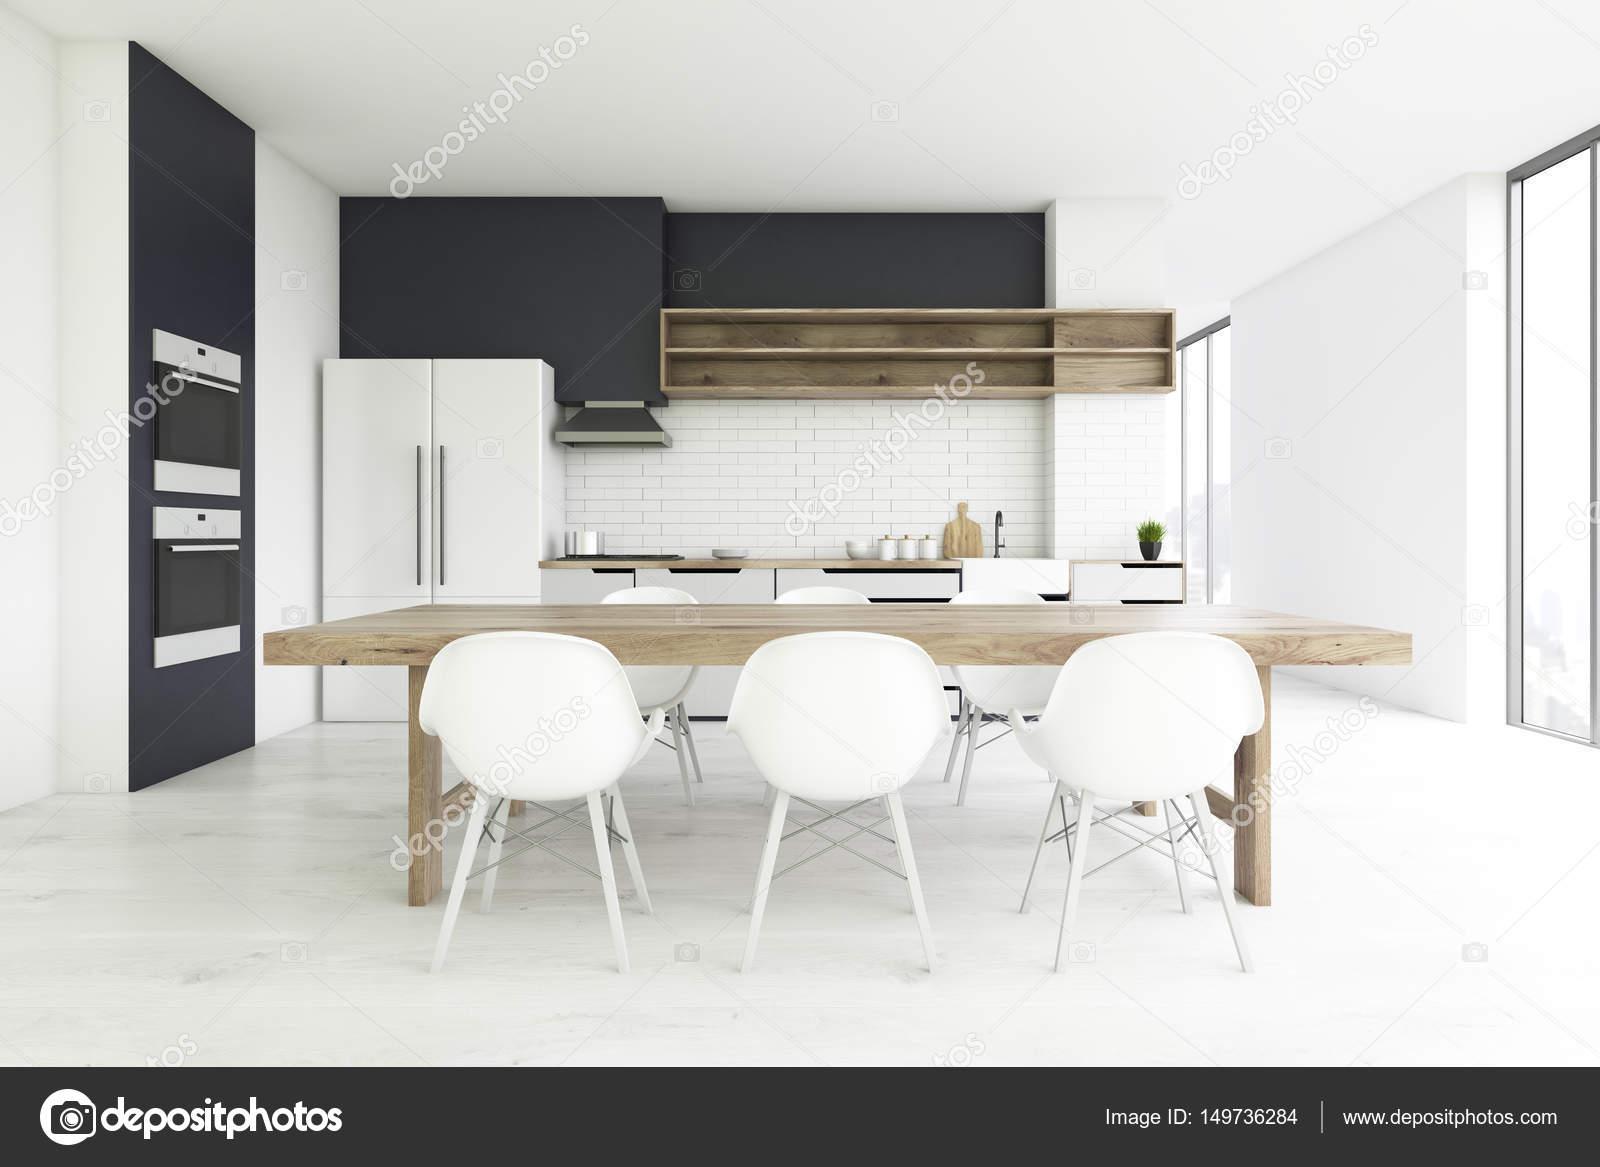 Beton Boden Küche, vorne — Stockfoto © denisismagilov #149736284